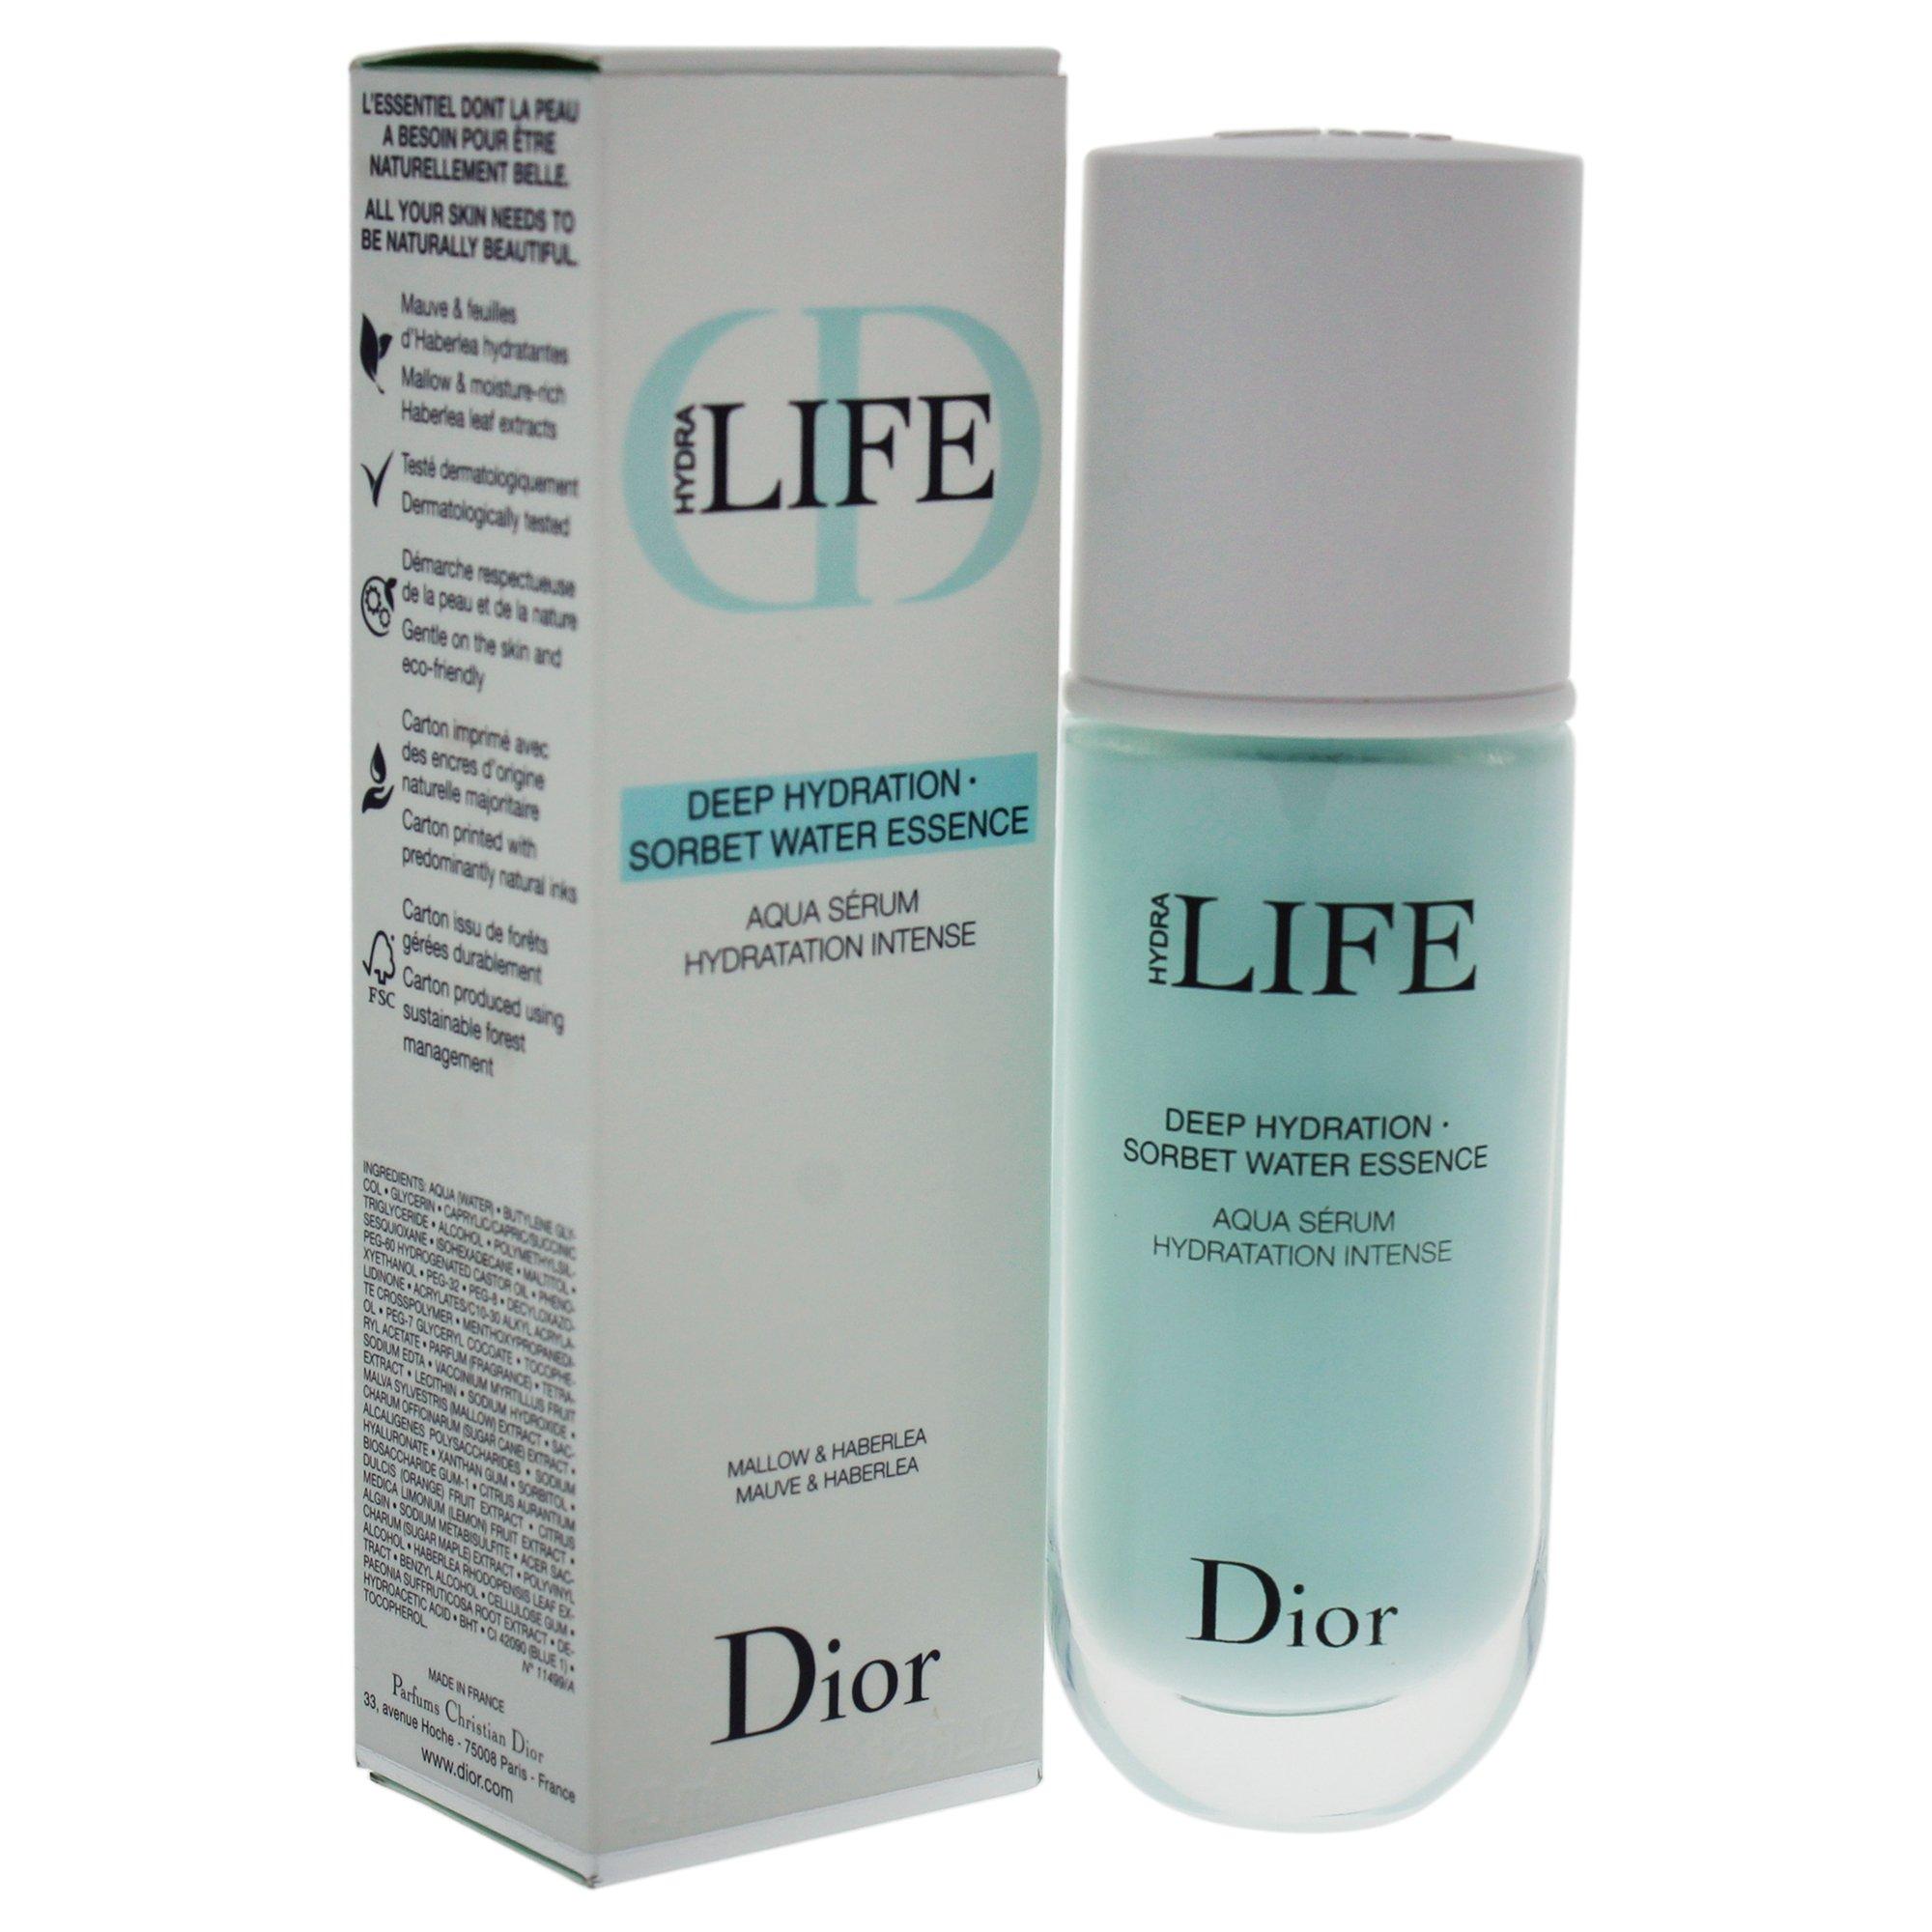 Christian Dior Hydra Life Deep Hydration Sorbet Water Essence Serum for Women, 1.3 Ounce